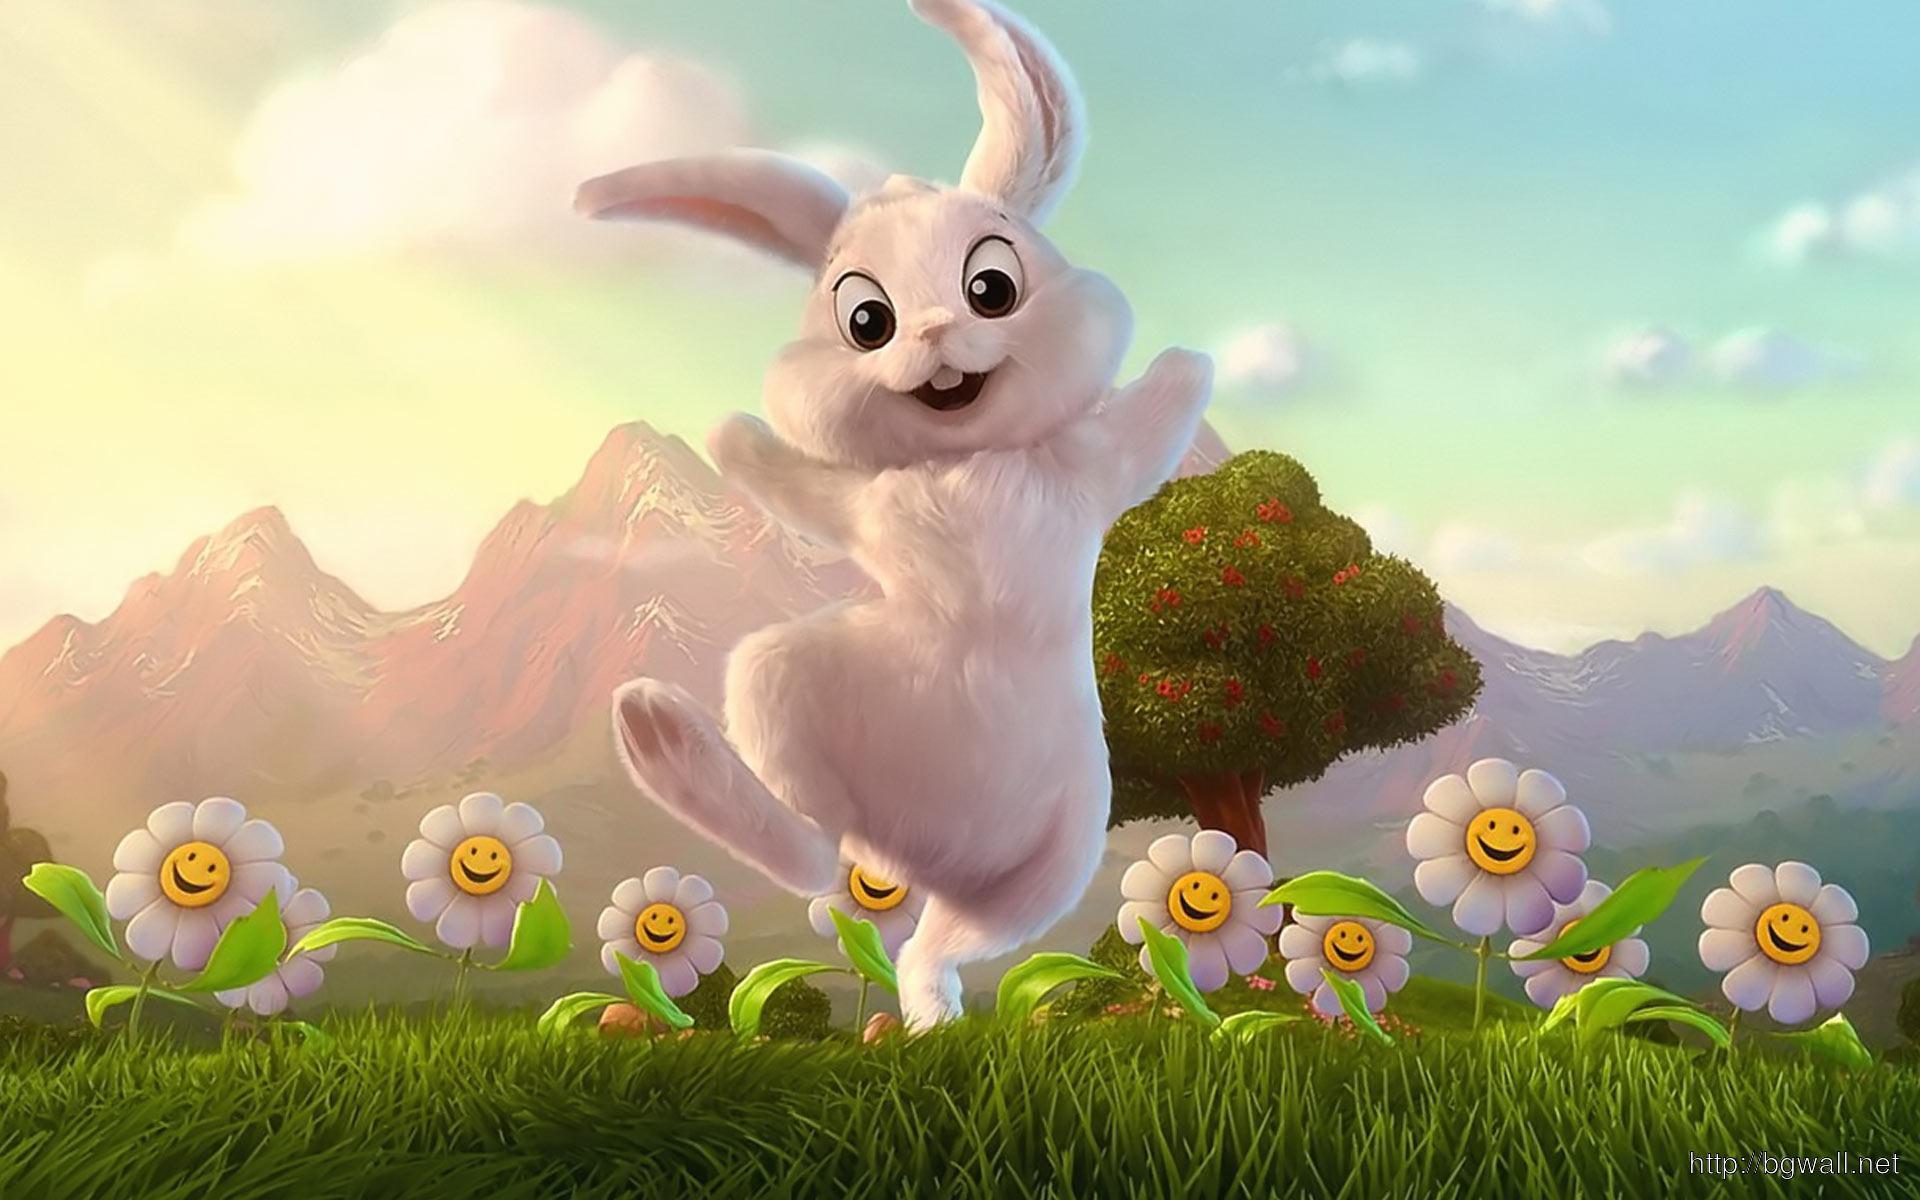 Cute Cartoon Easter Bunny Wallpaper 1920x1200